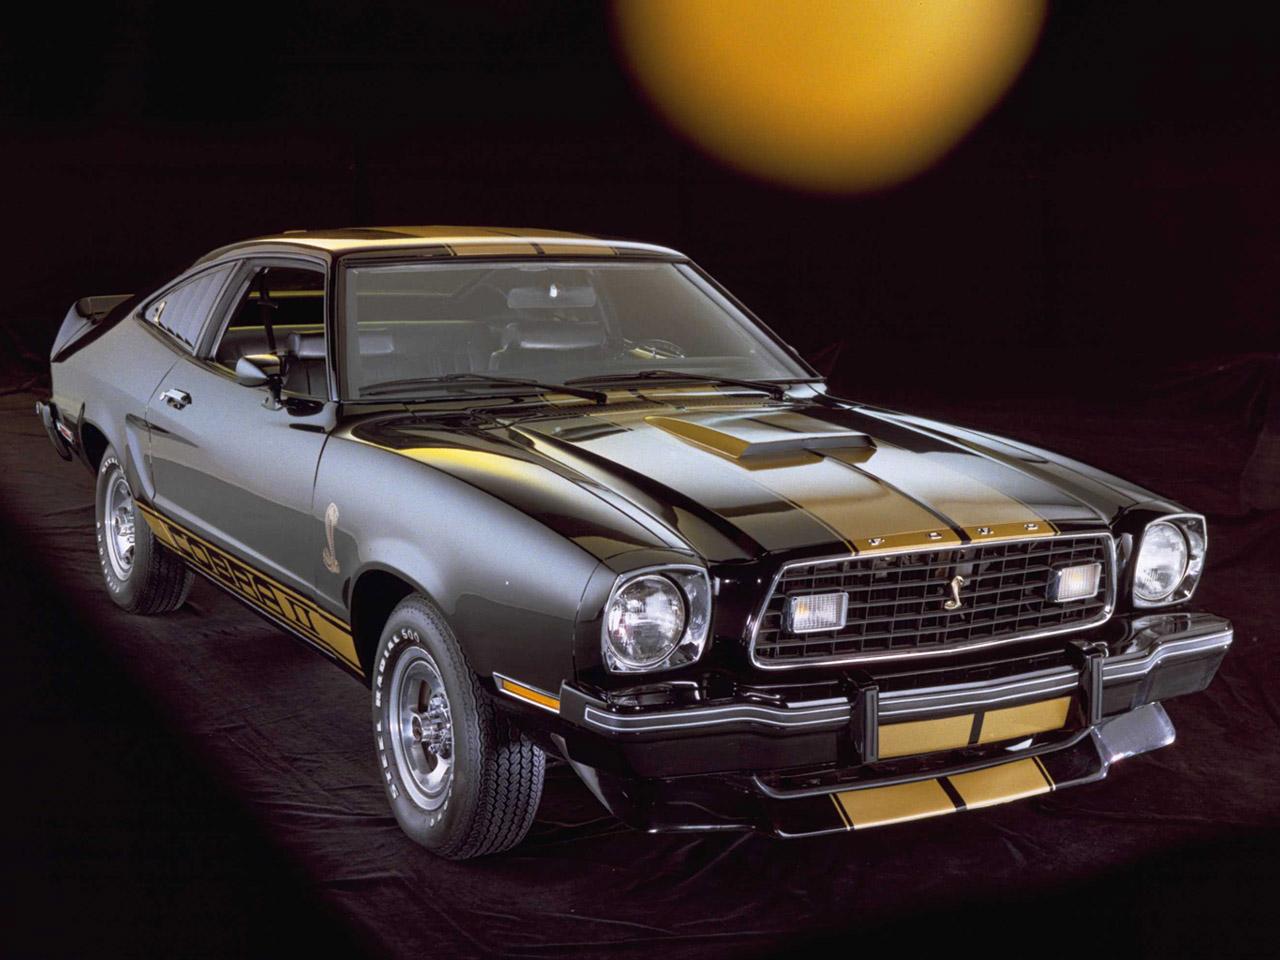 Mustang Cobra GT500jpg 1280x960